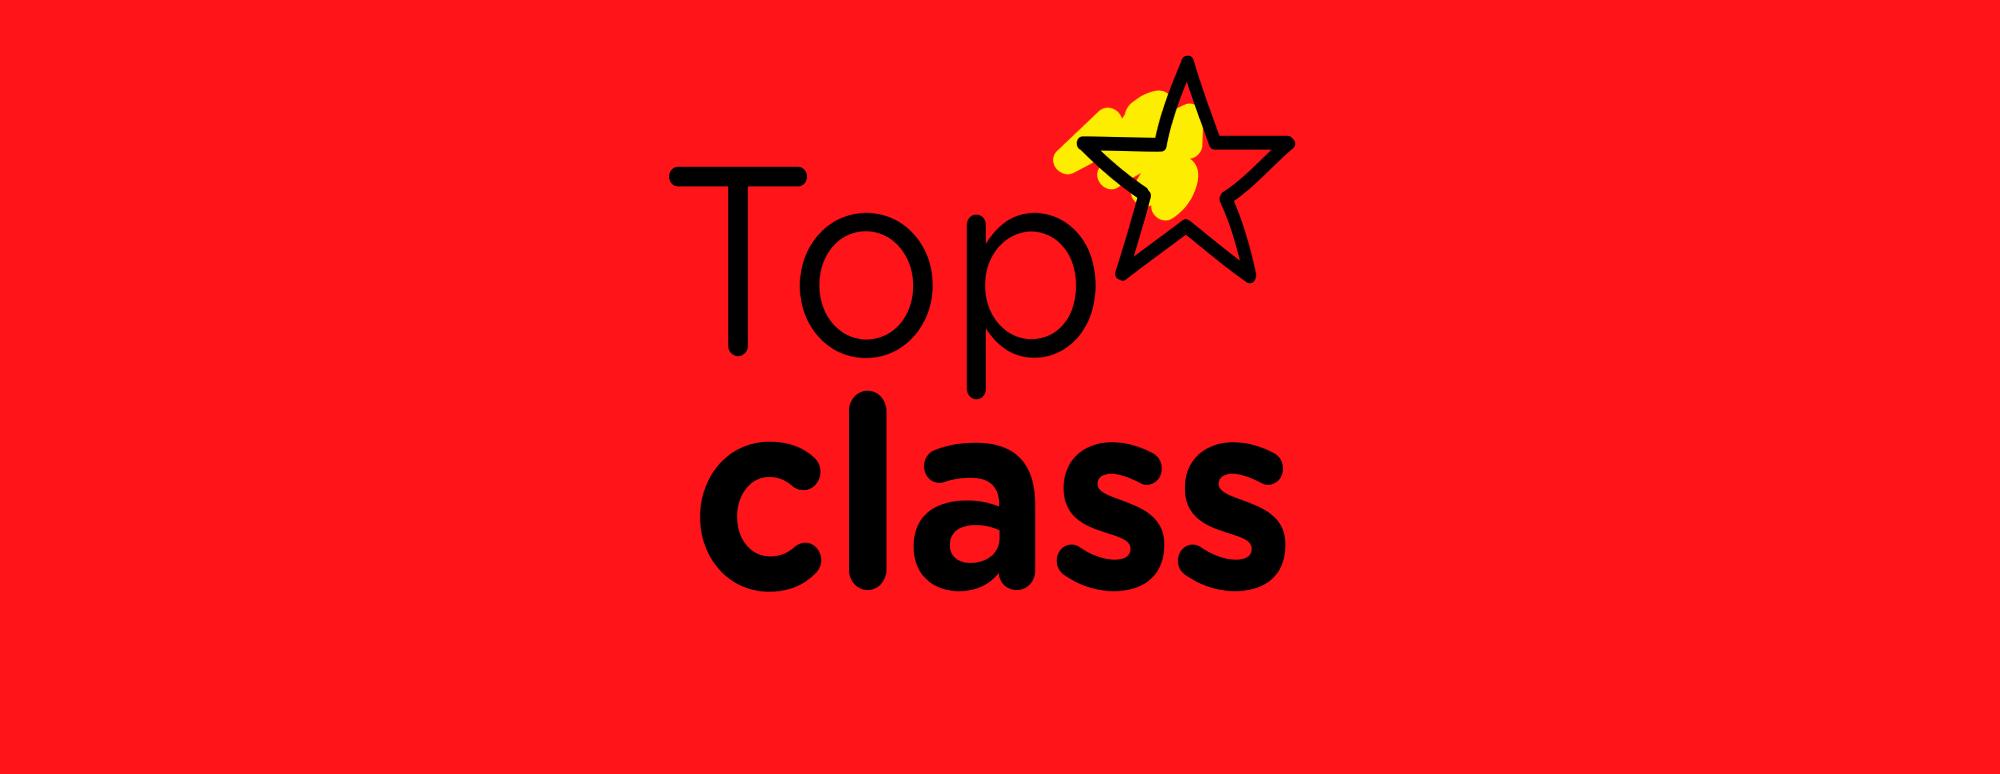 Top Class - Tunja